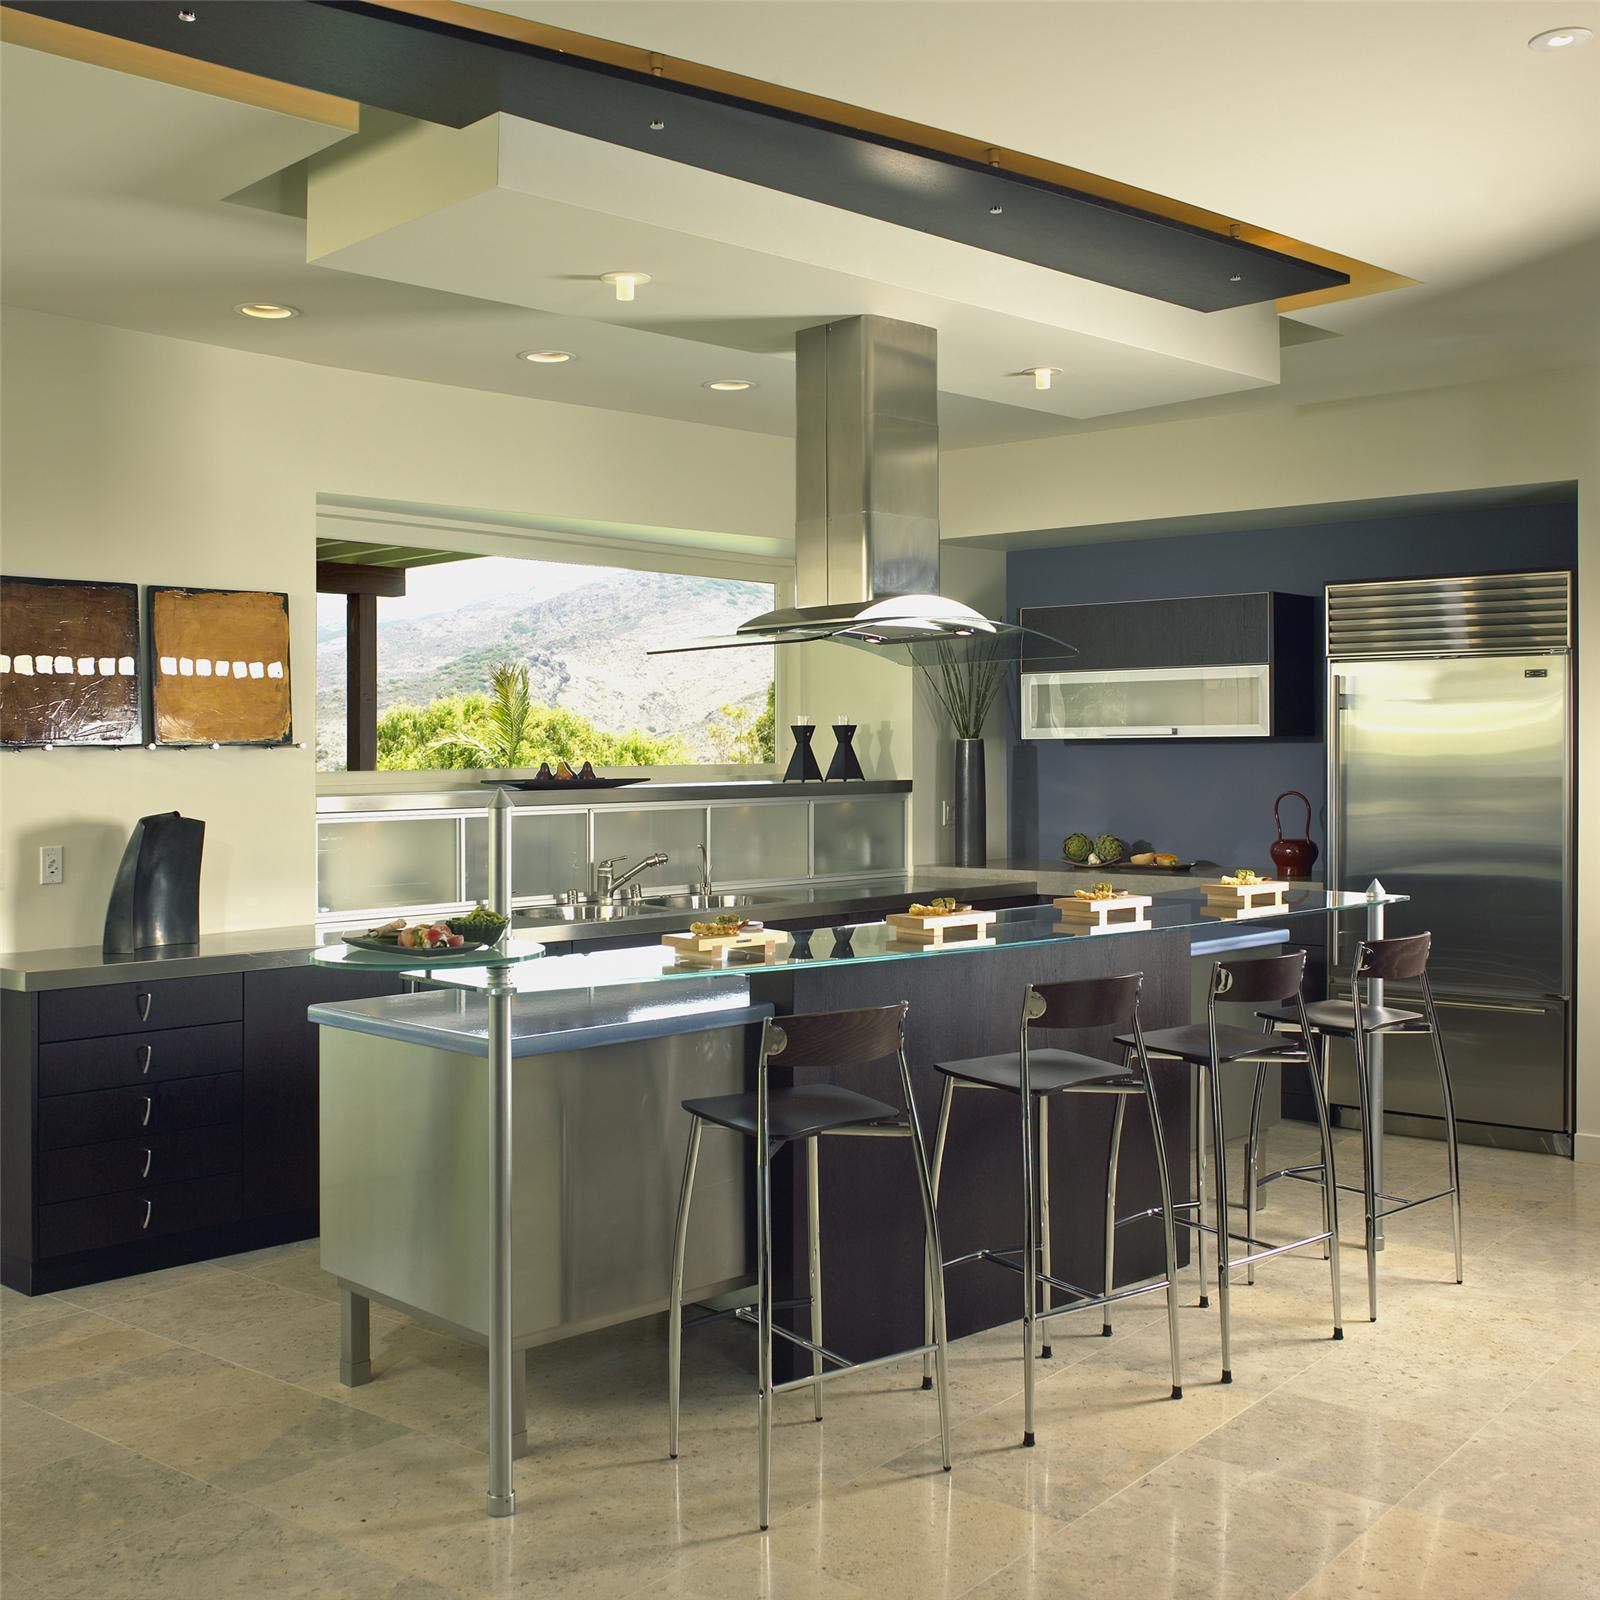 Open Contemporary Kitchen Design Ideas | iDesignArch ... on Modern Kitchen Design Ideas  id=18366